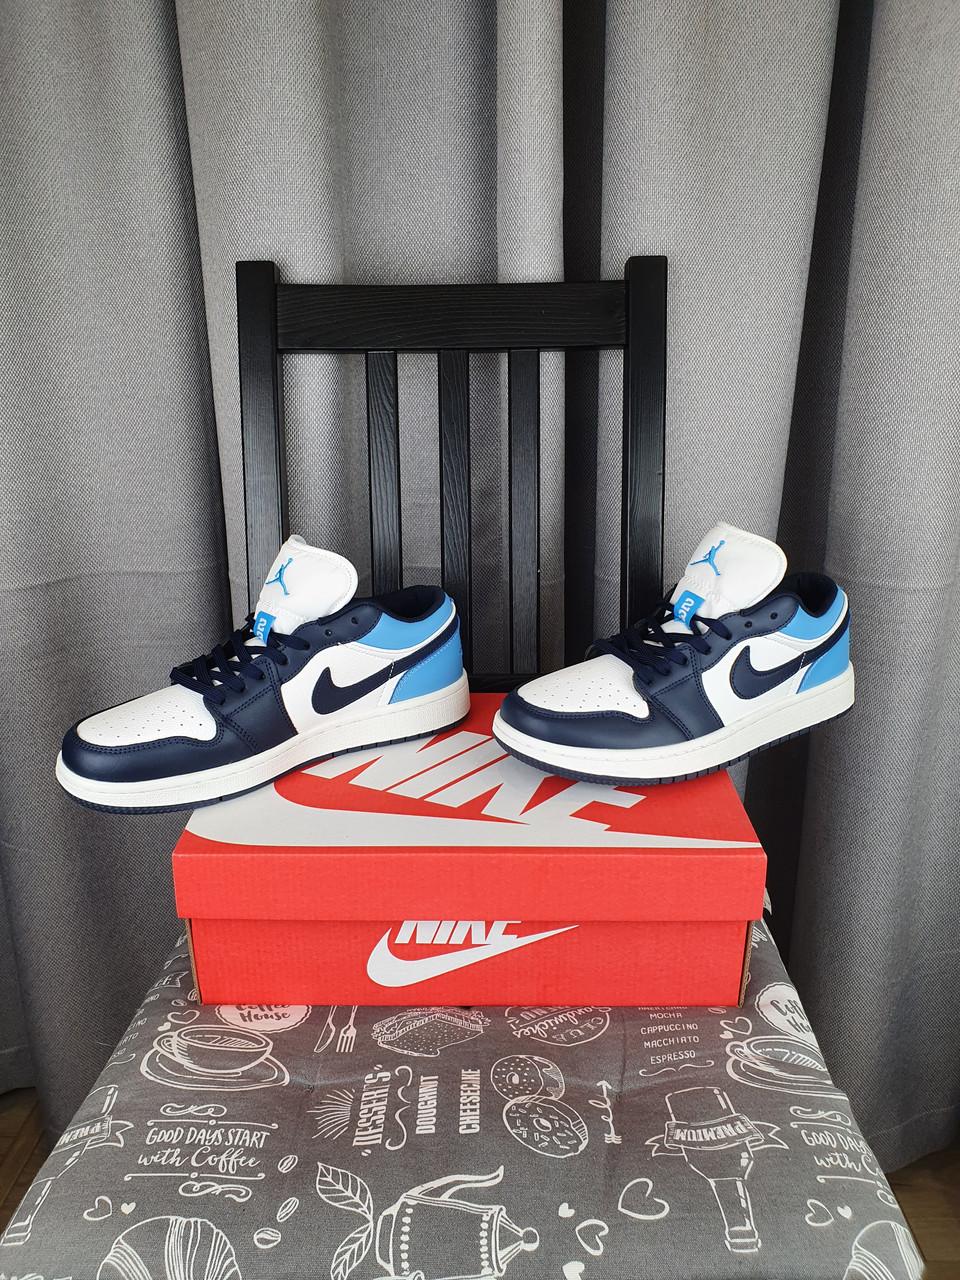 Кроссовки мужские Nike Air Jordan 1 Low Obsidianсиние. Мужские кроссовки Найк Аир Джордан Ретро синего цвета.